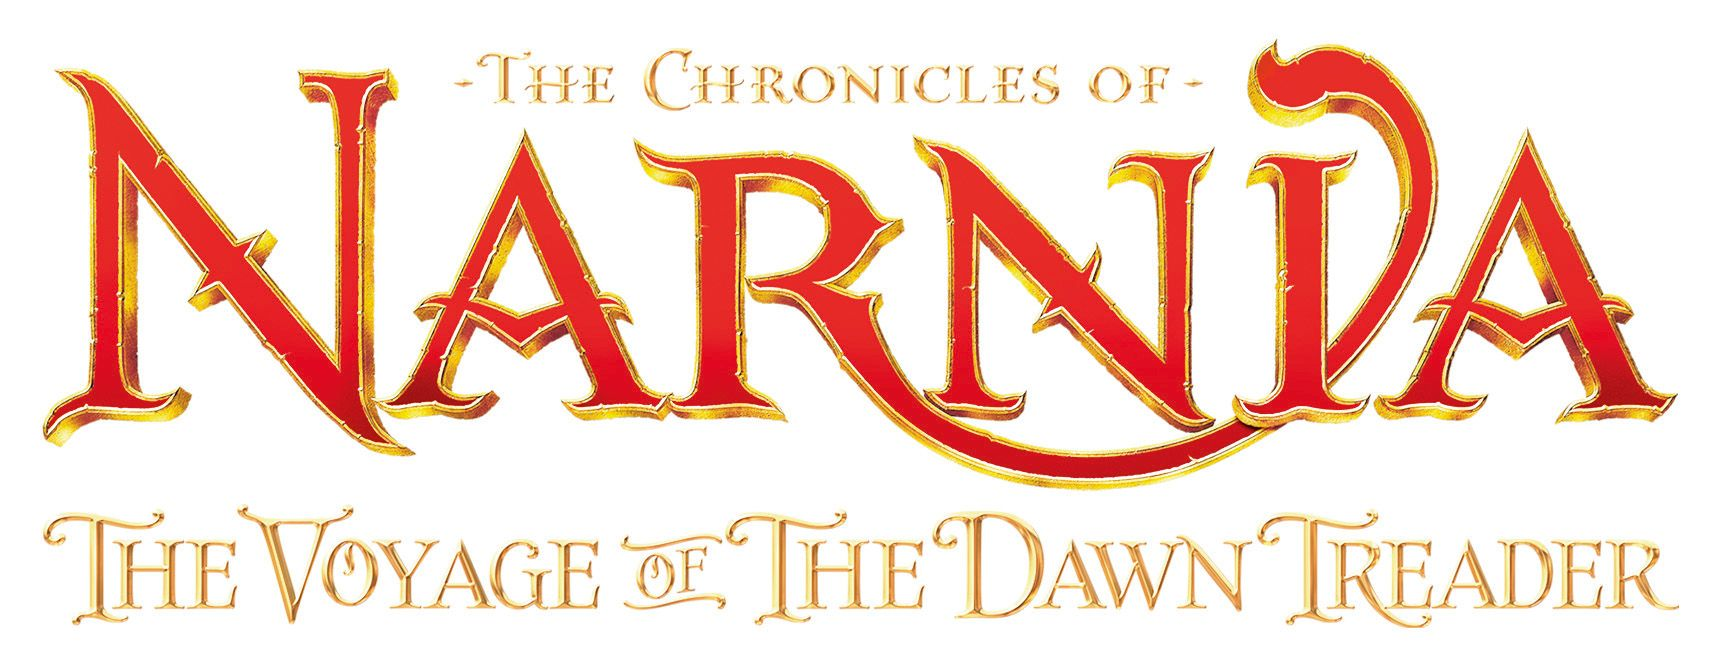 narnia the voyage of the dawn treader movie image logo jpg 1735 rh pinterest com narnia logo vector narnia logos theatre